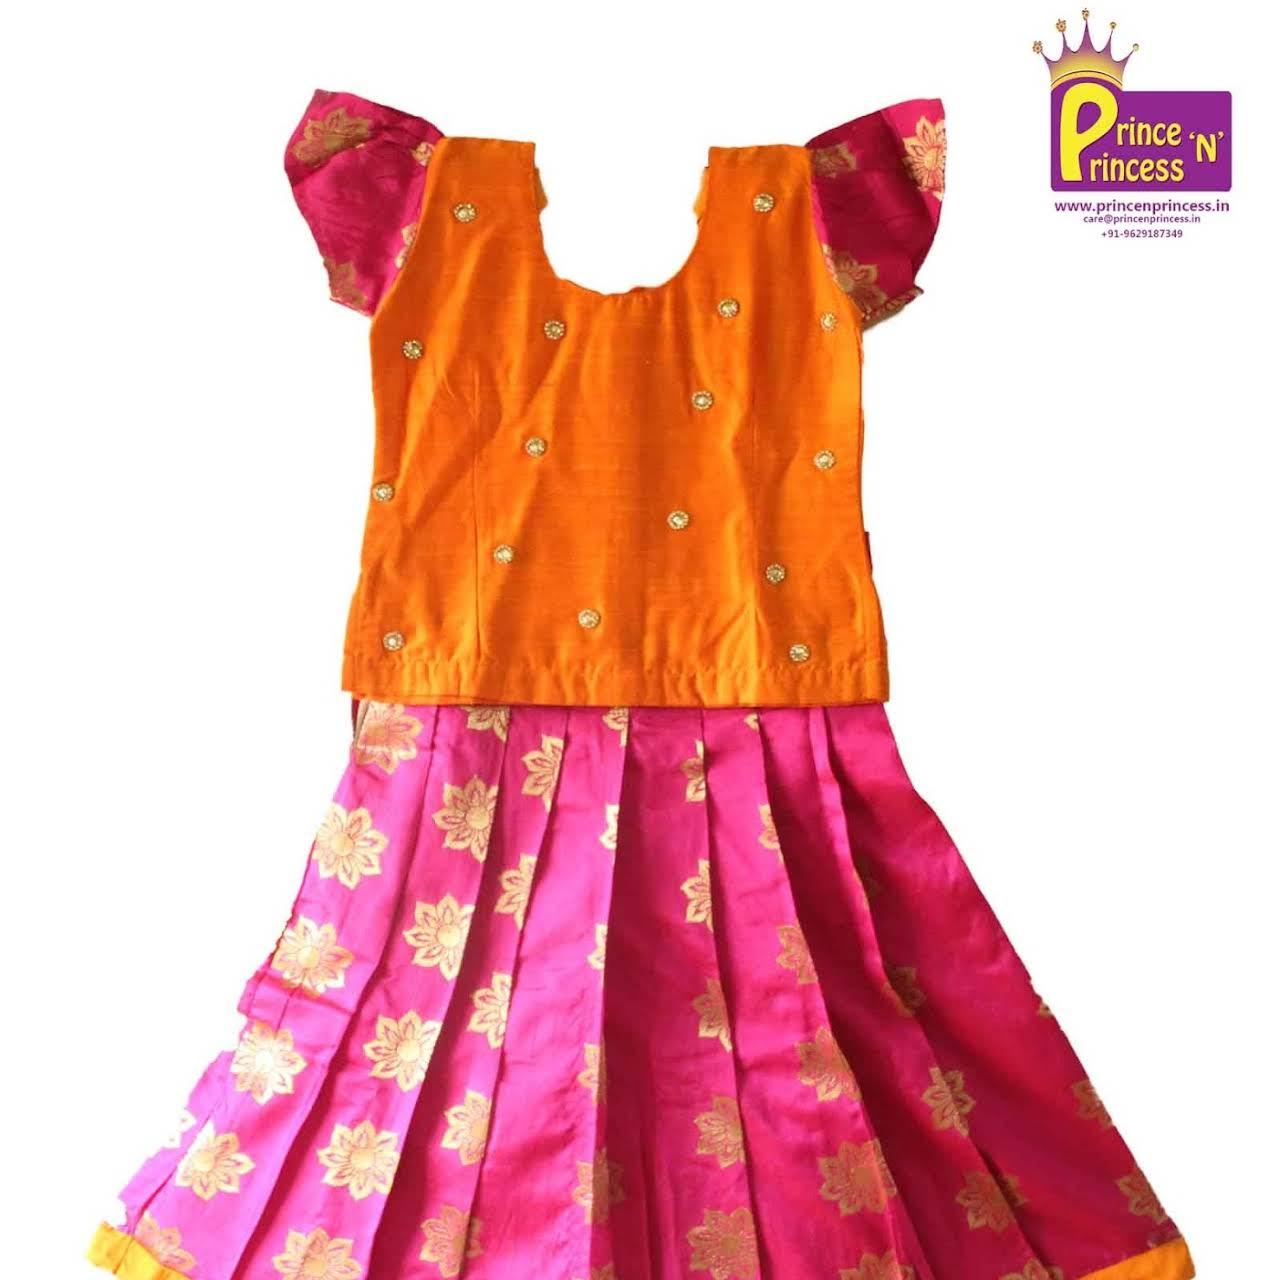 dd9b3a72ea Prince N Princess - Kids Pattu Pavadai , Frock, Gown, Lehanga Choli ...